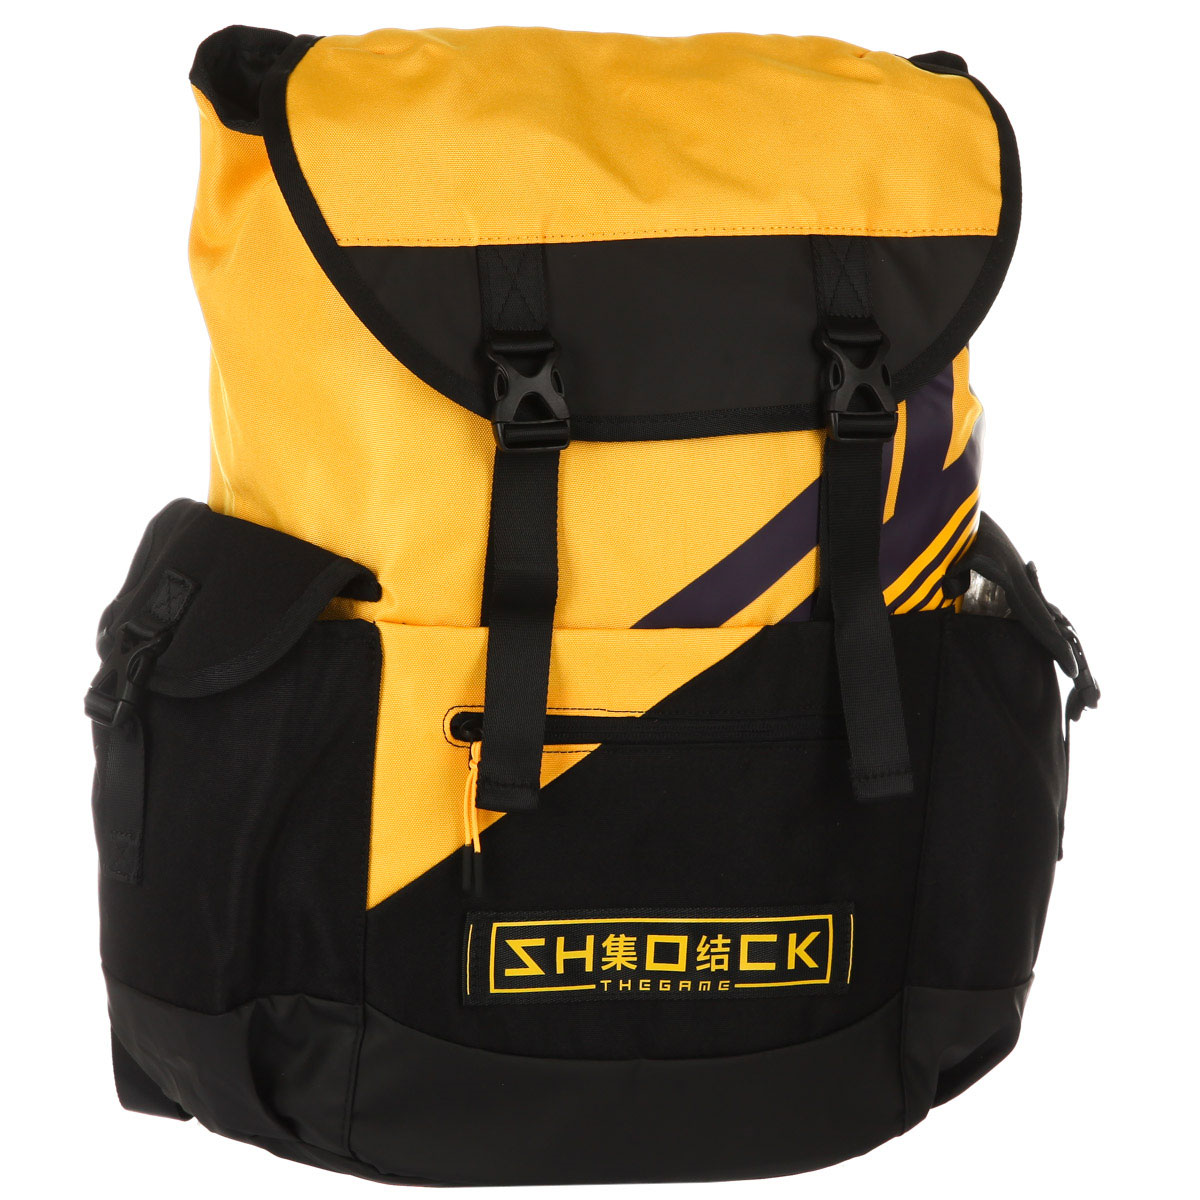 Купить Другие товары ANTA, Рюкзак ANTA Backpack Shock The Game 3.0, Жёлтый